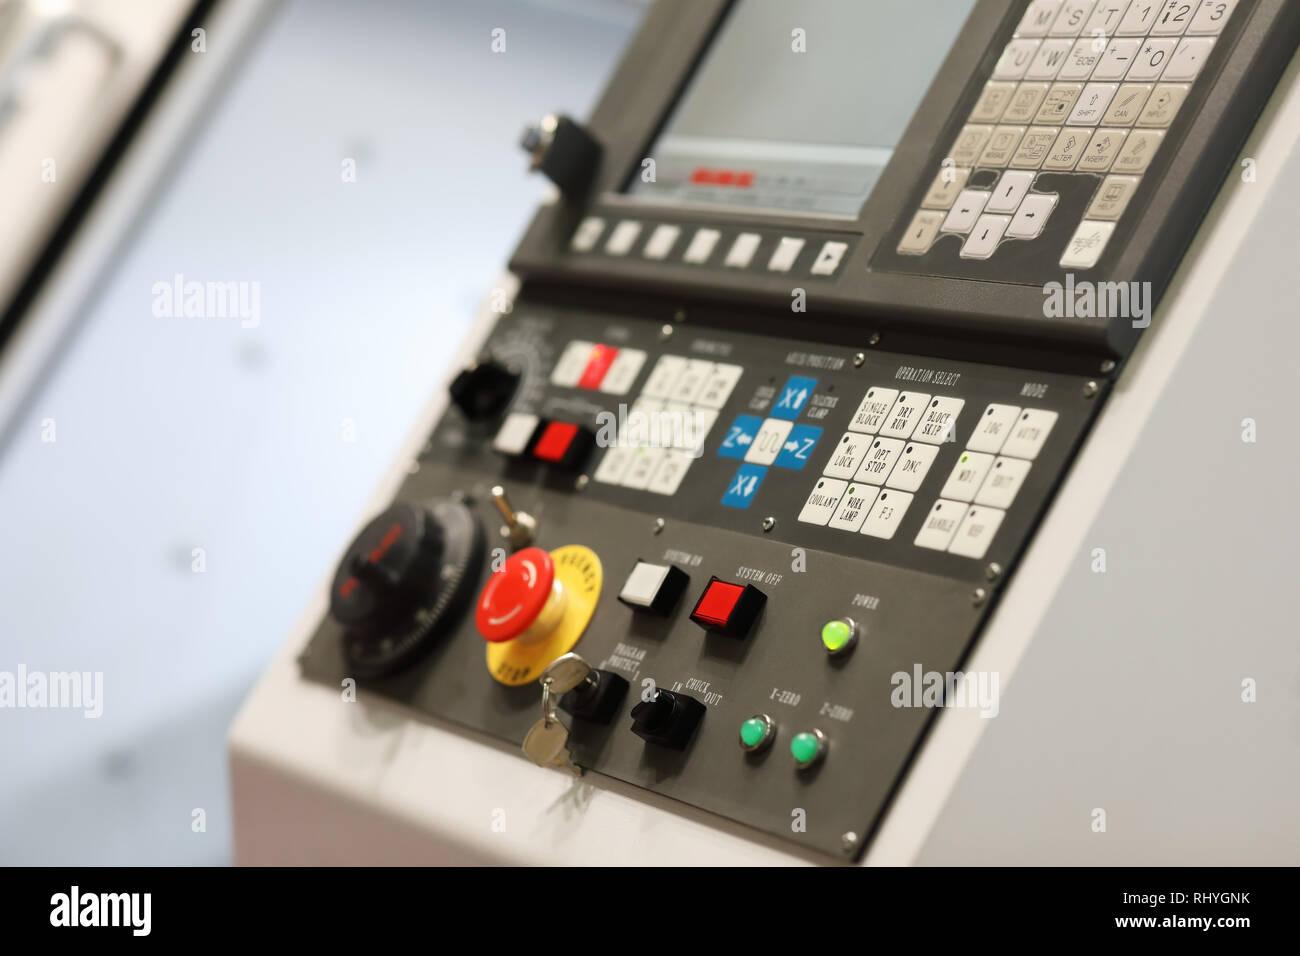 CNC control panel of metalworking lathe machine. Selective focus. - Stock Image